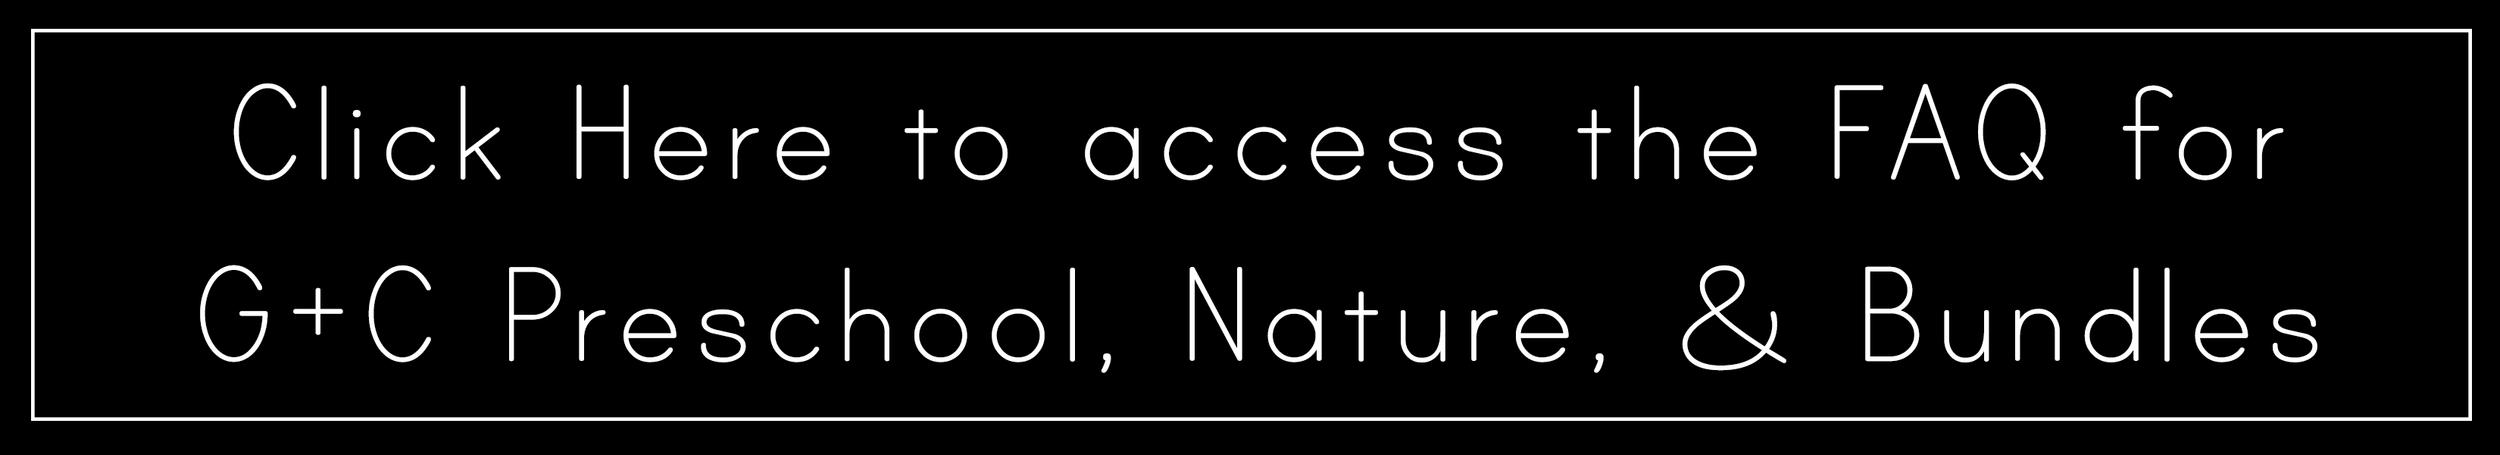 access faq.png